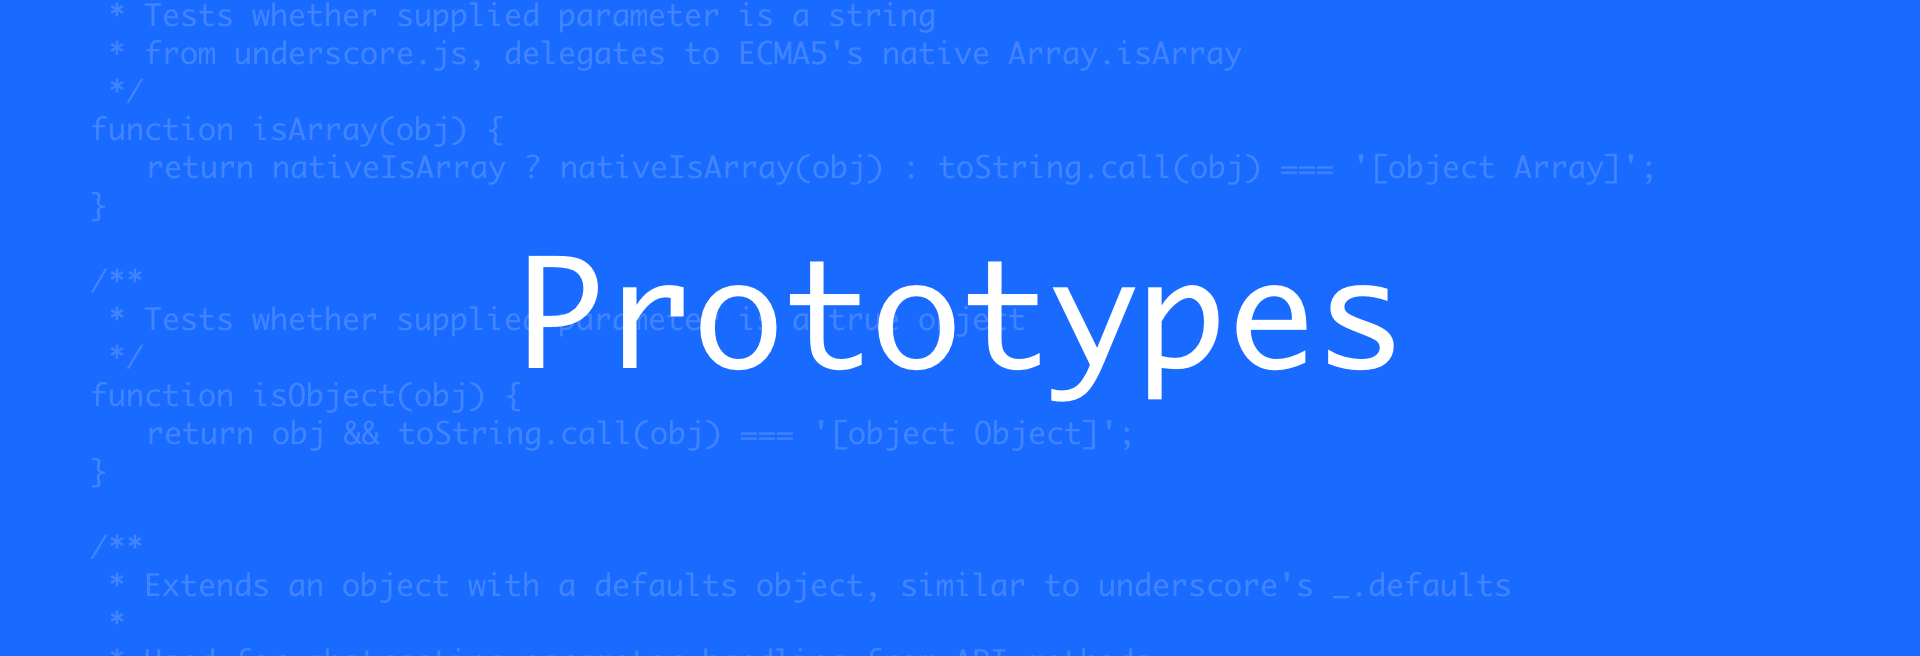 prototypes@2x.png